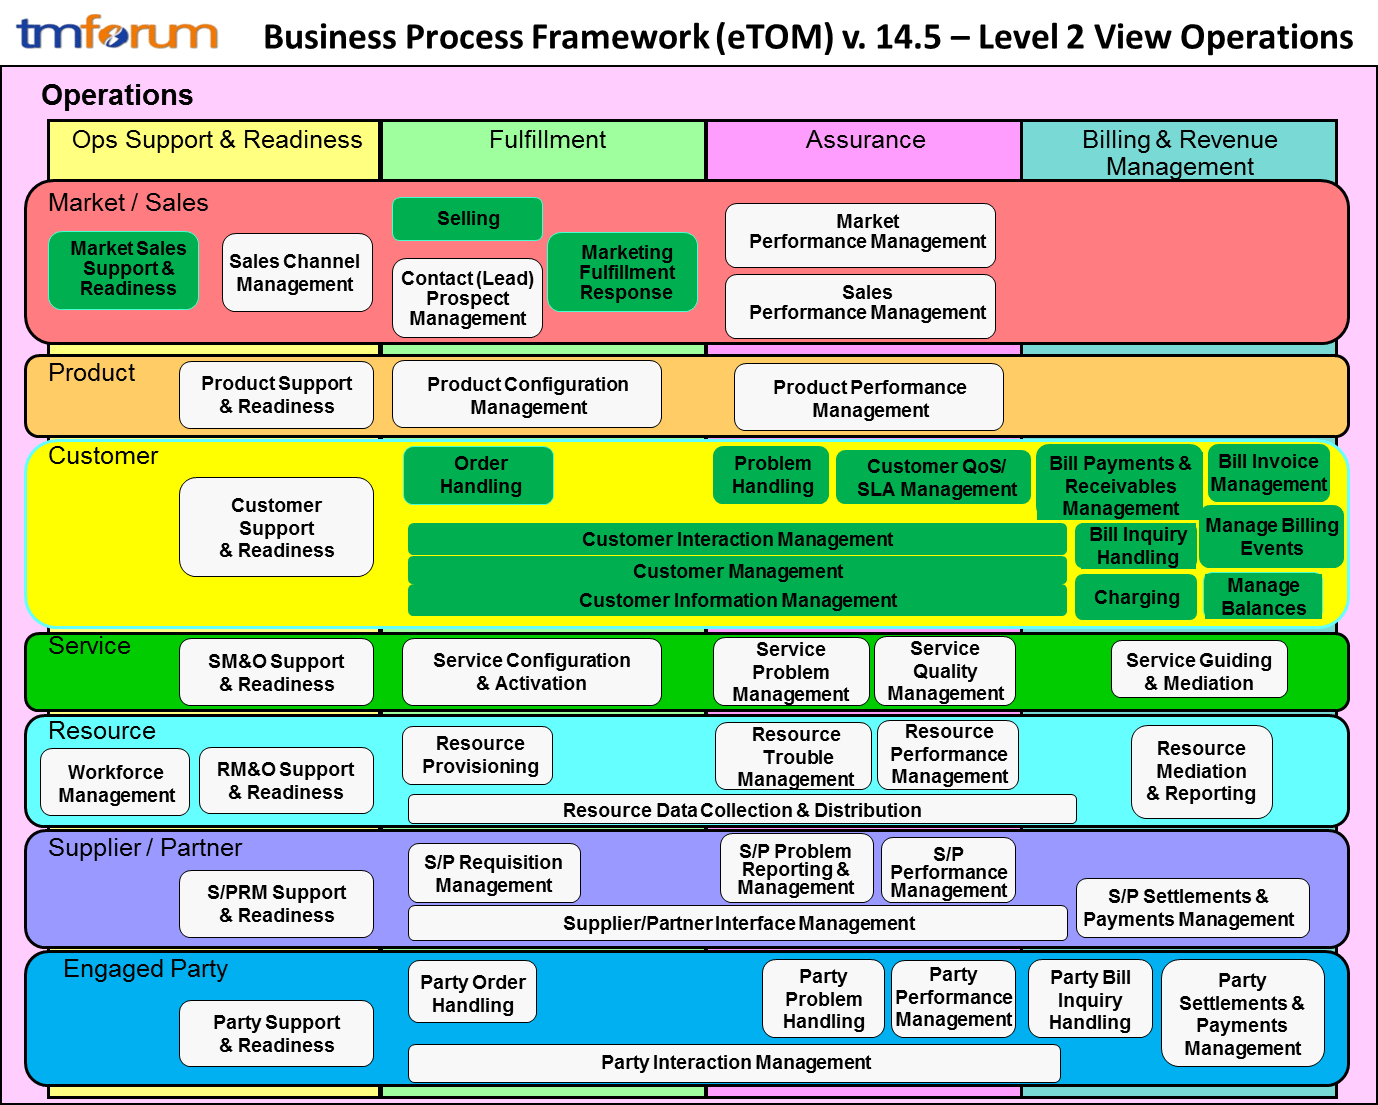 Telefnica business process blueprint design tm forum scope of assessment business process framework footprint malvernweather Gallery